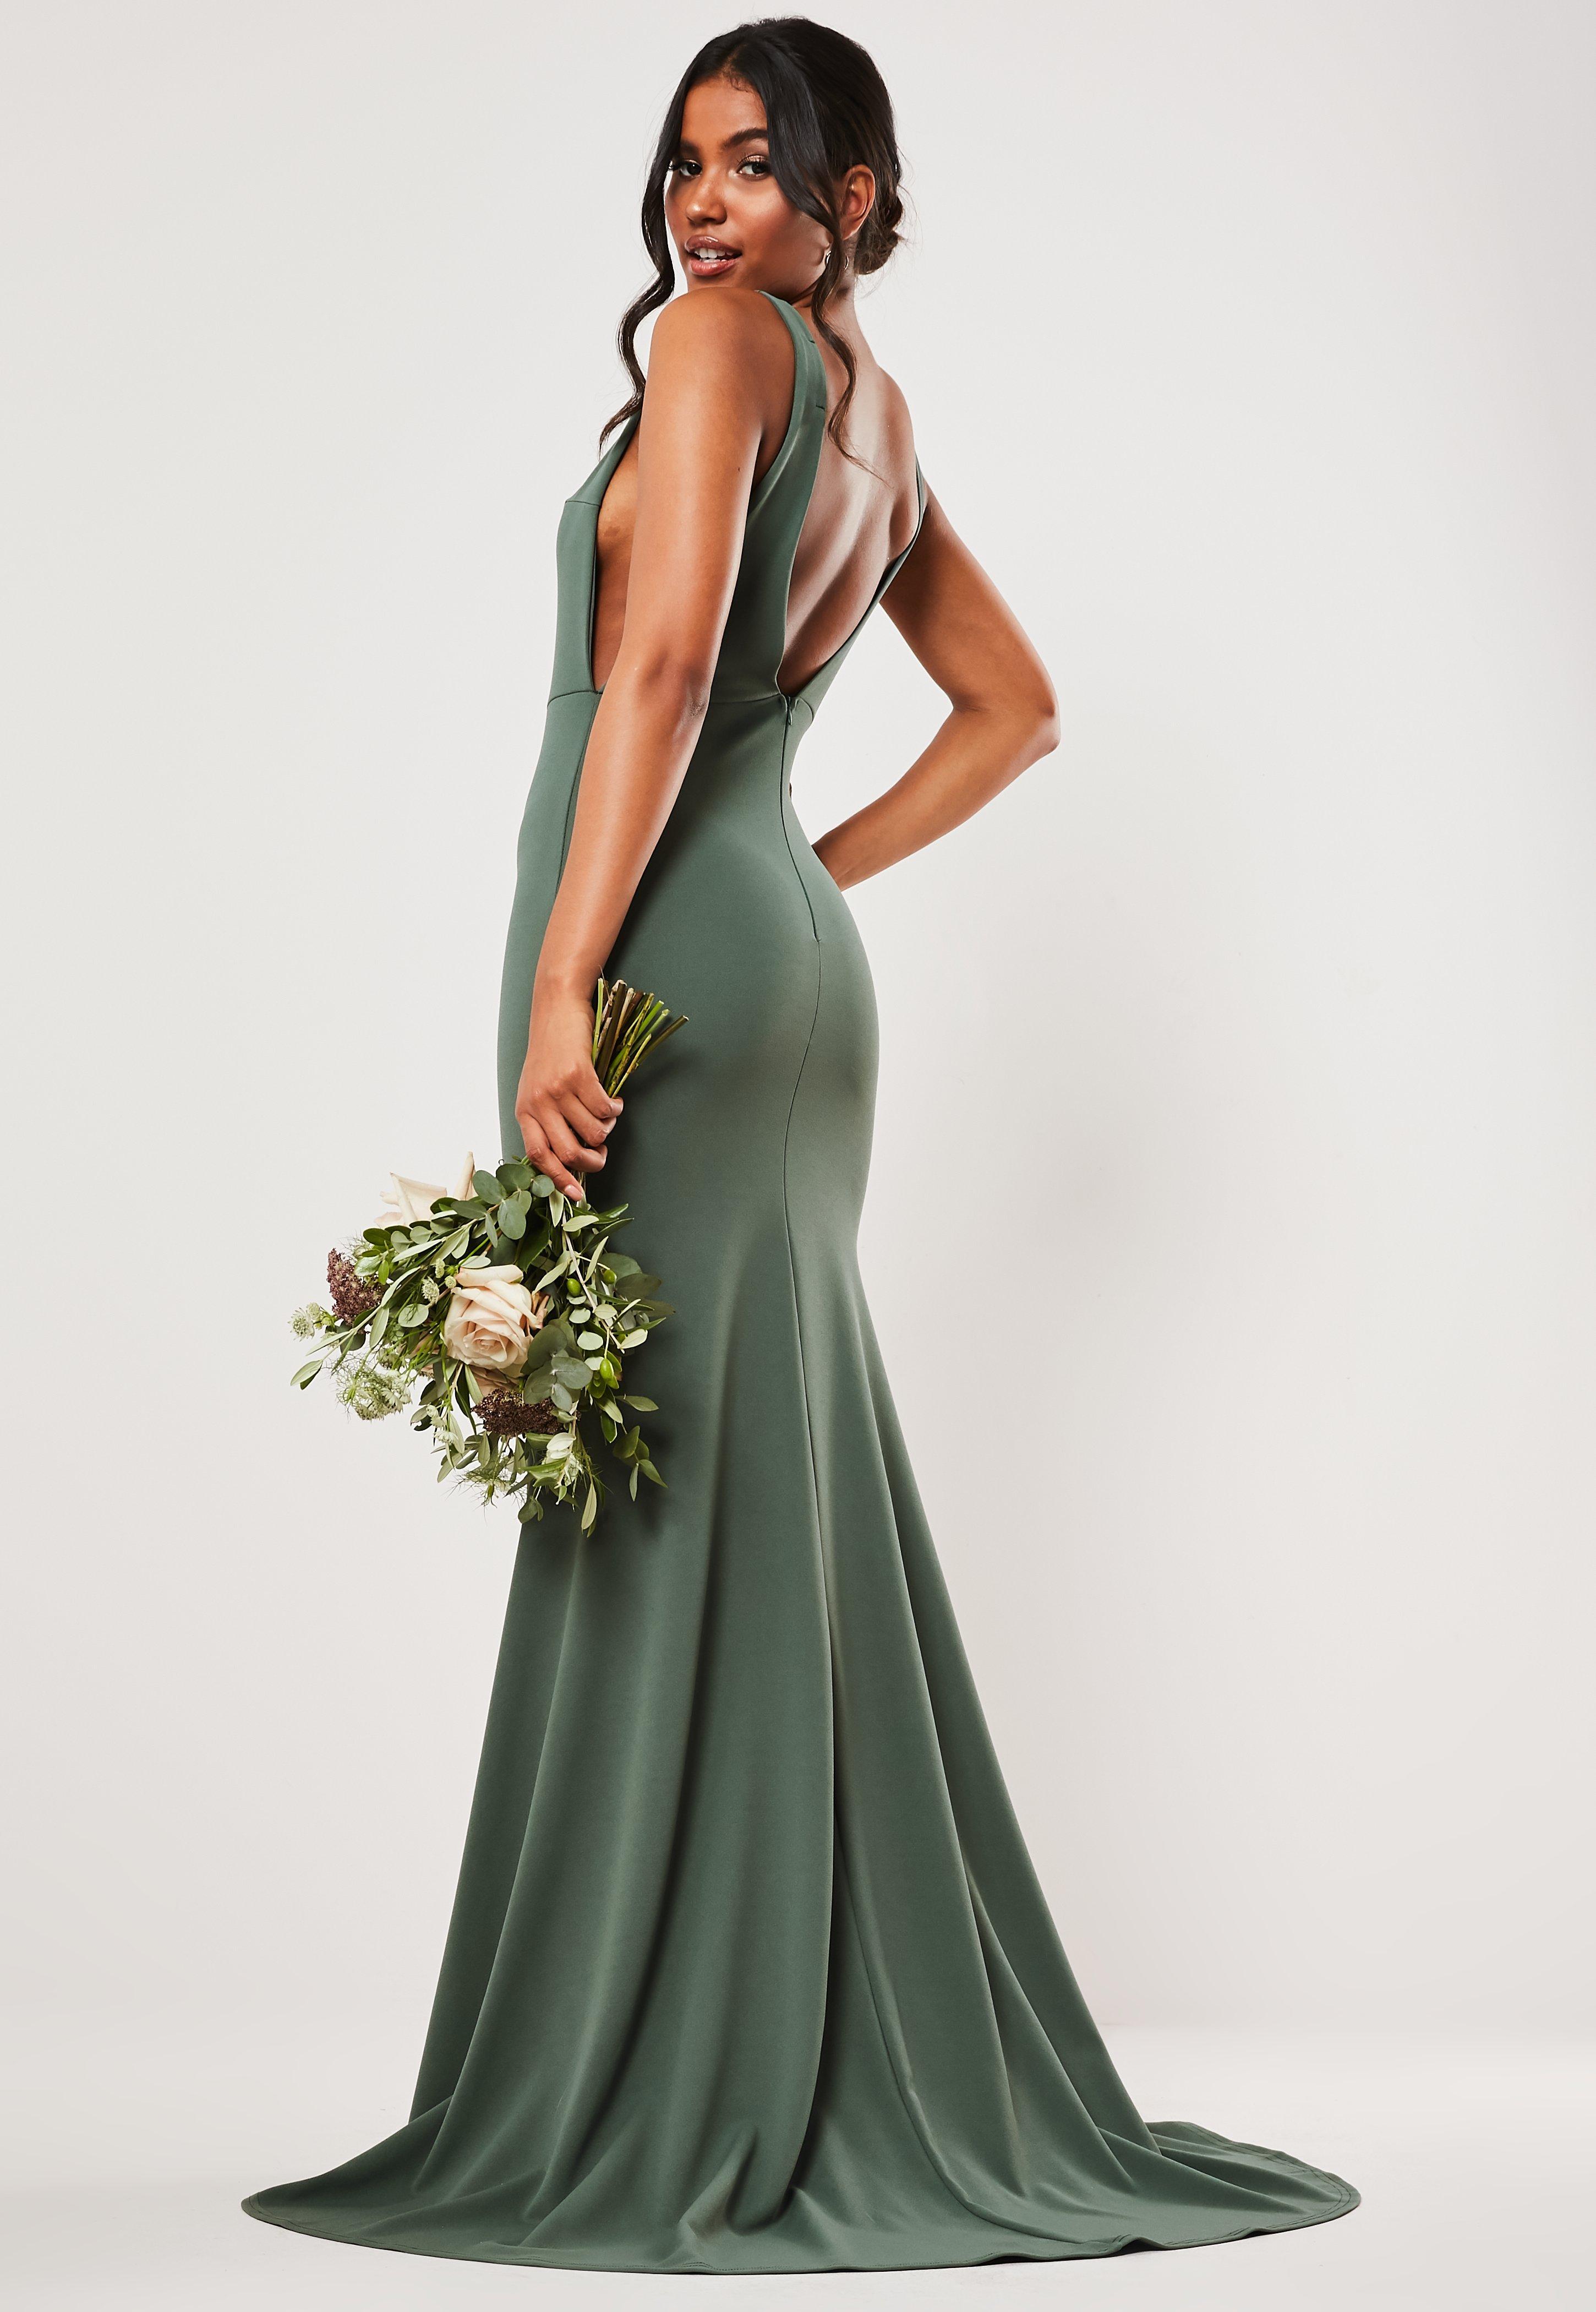 7bf1f61713bdf Bridesmaid Green Sleeveless Low Back Maxi Dress